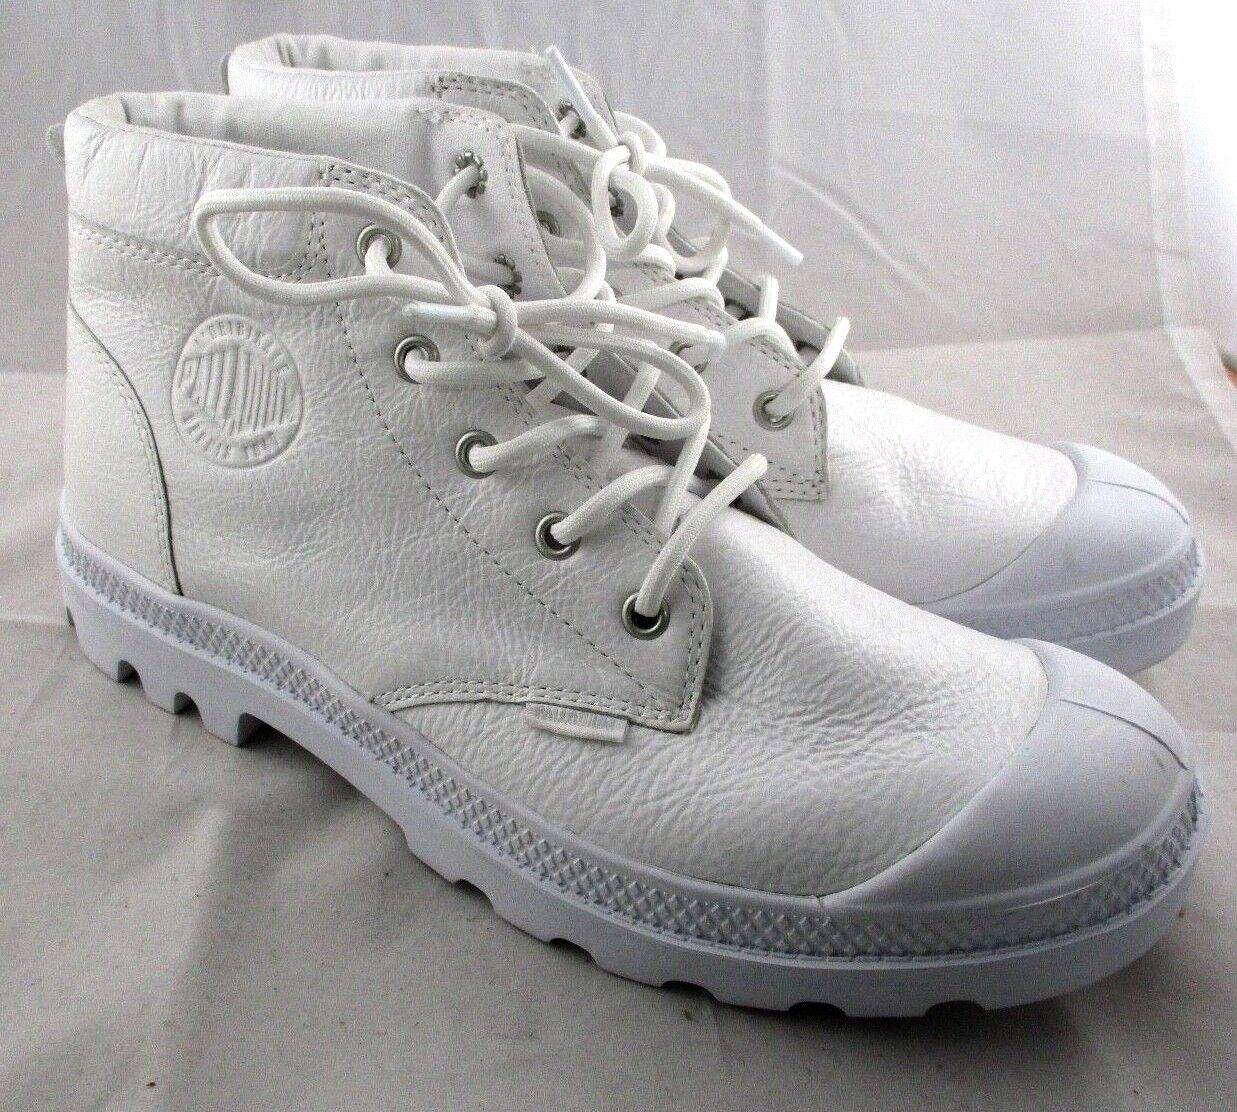 Femme PALLADIUM Leather PAMPA Low Bottes SNEAKER Blanc